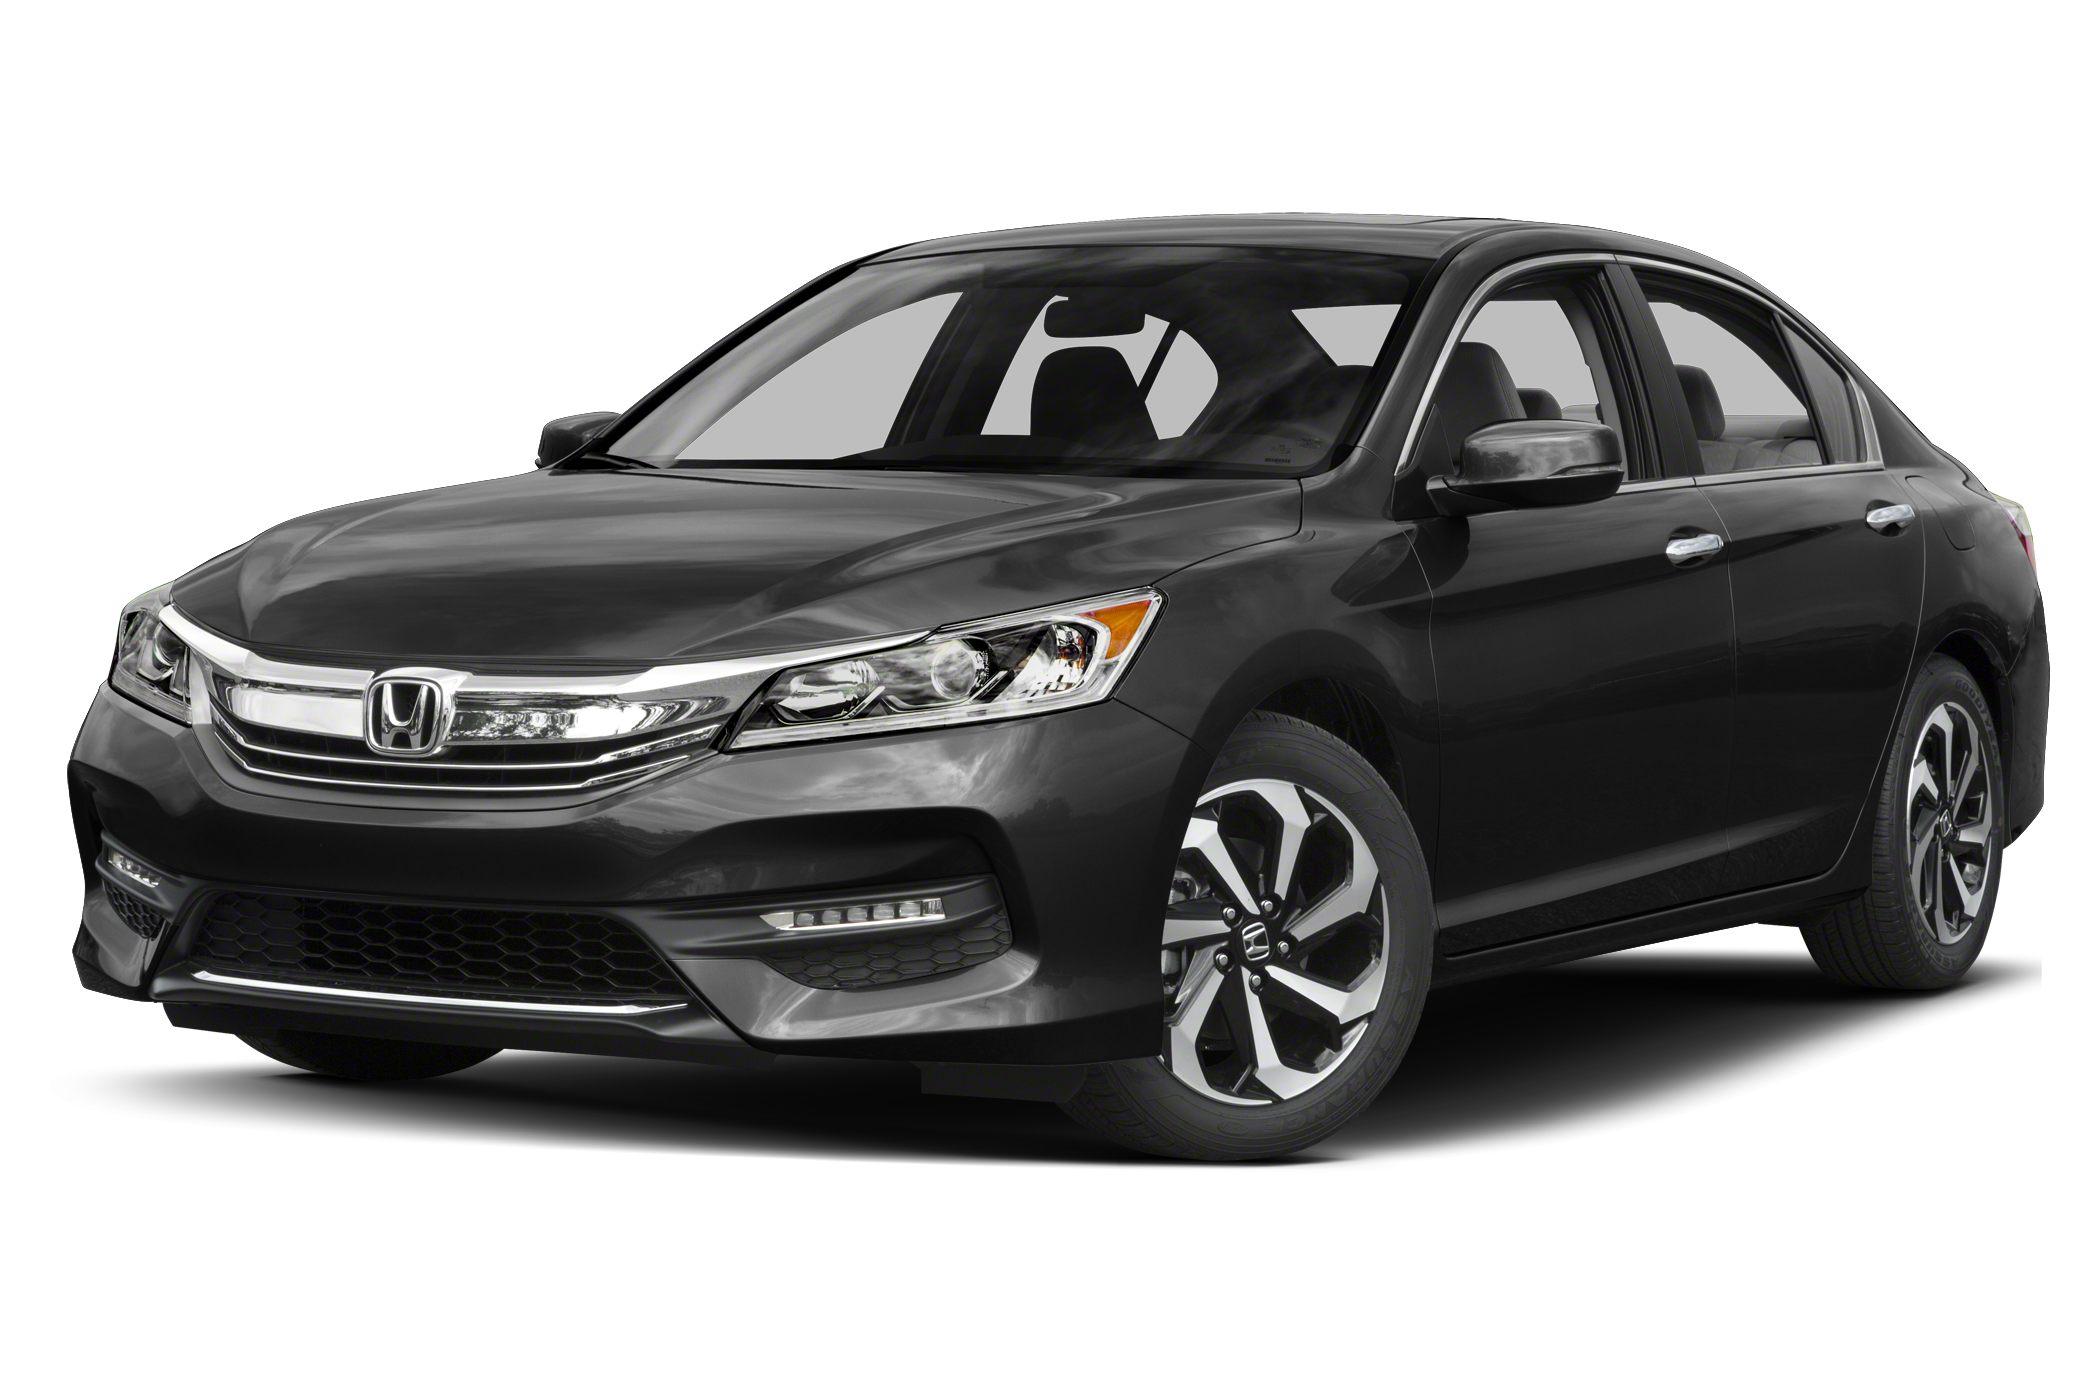 2017 Honda Accord EX 4dr Sedan